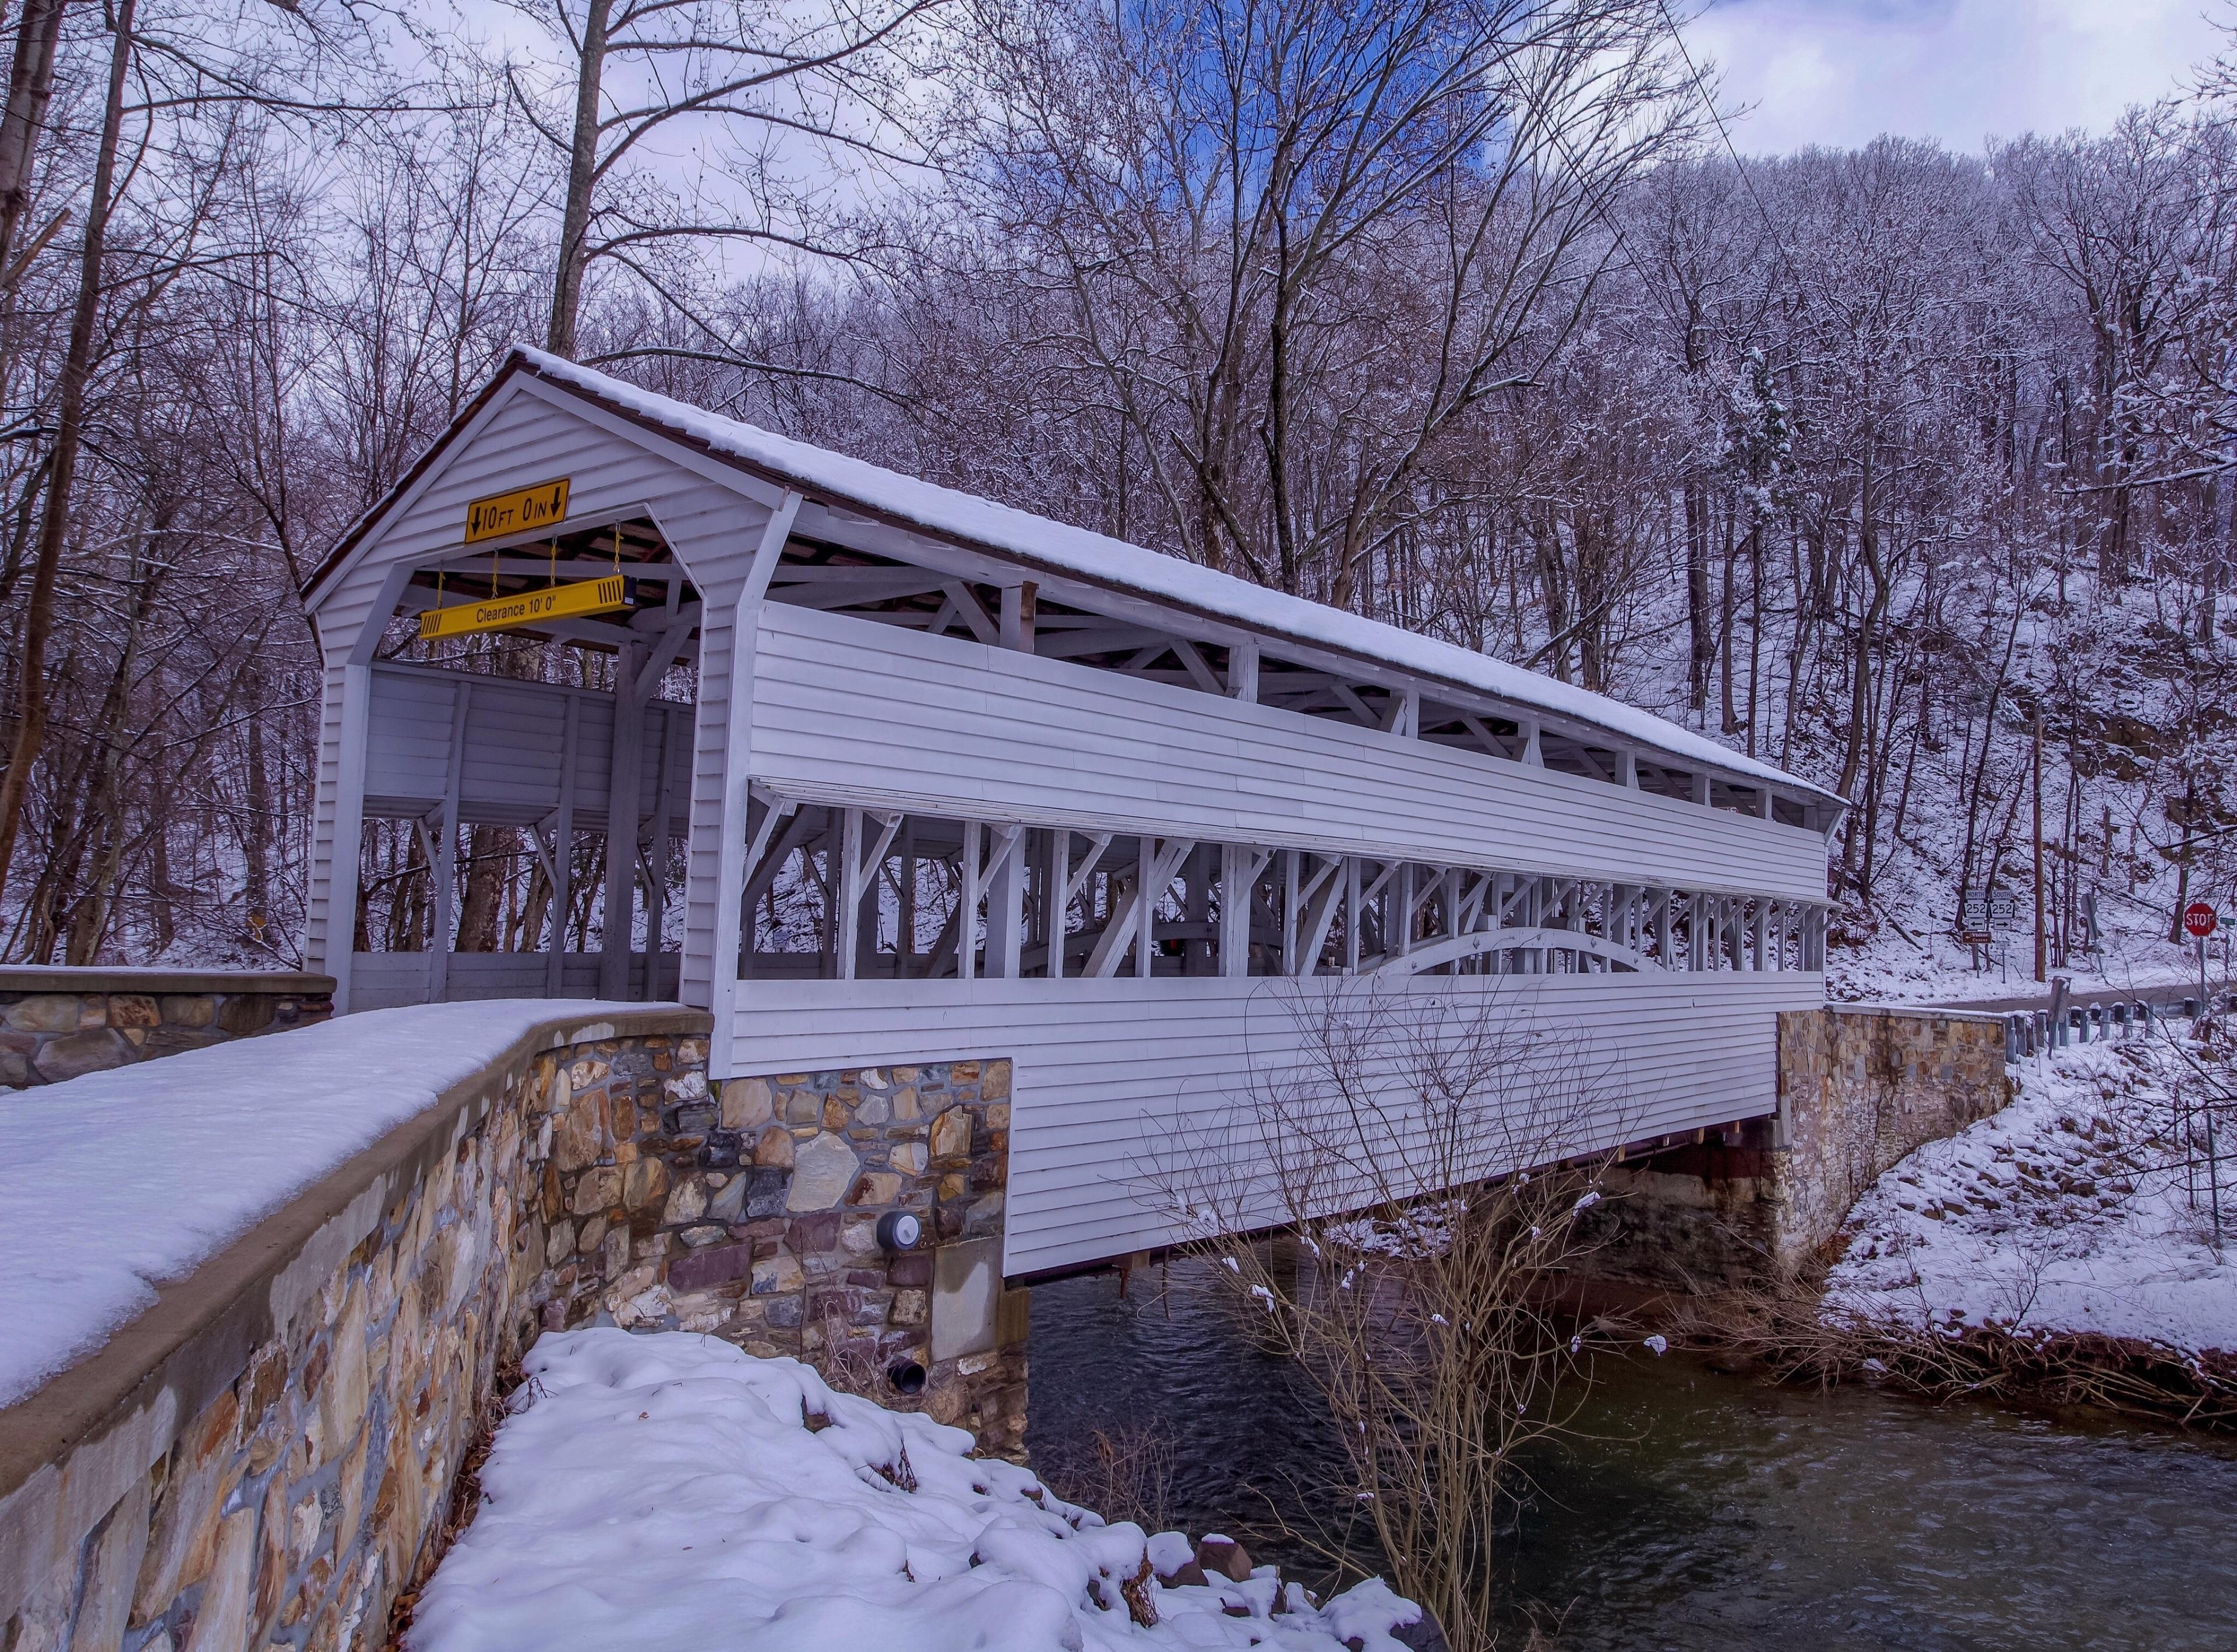 Tredyffrin Township, Pennsylvania, Verenigde Staten